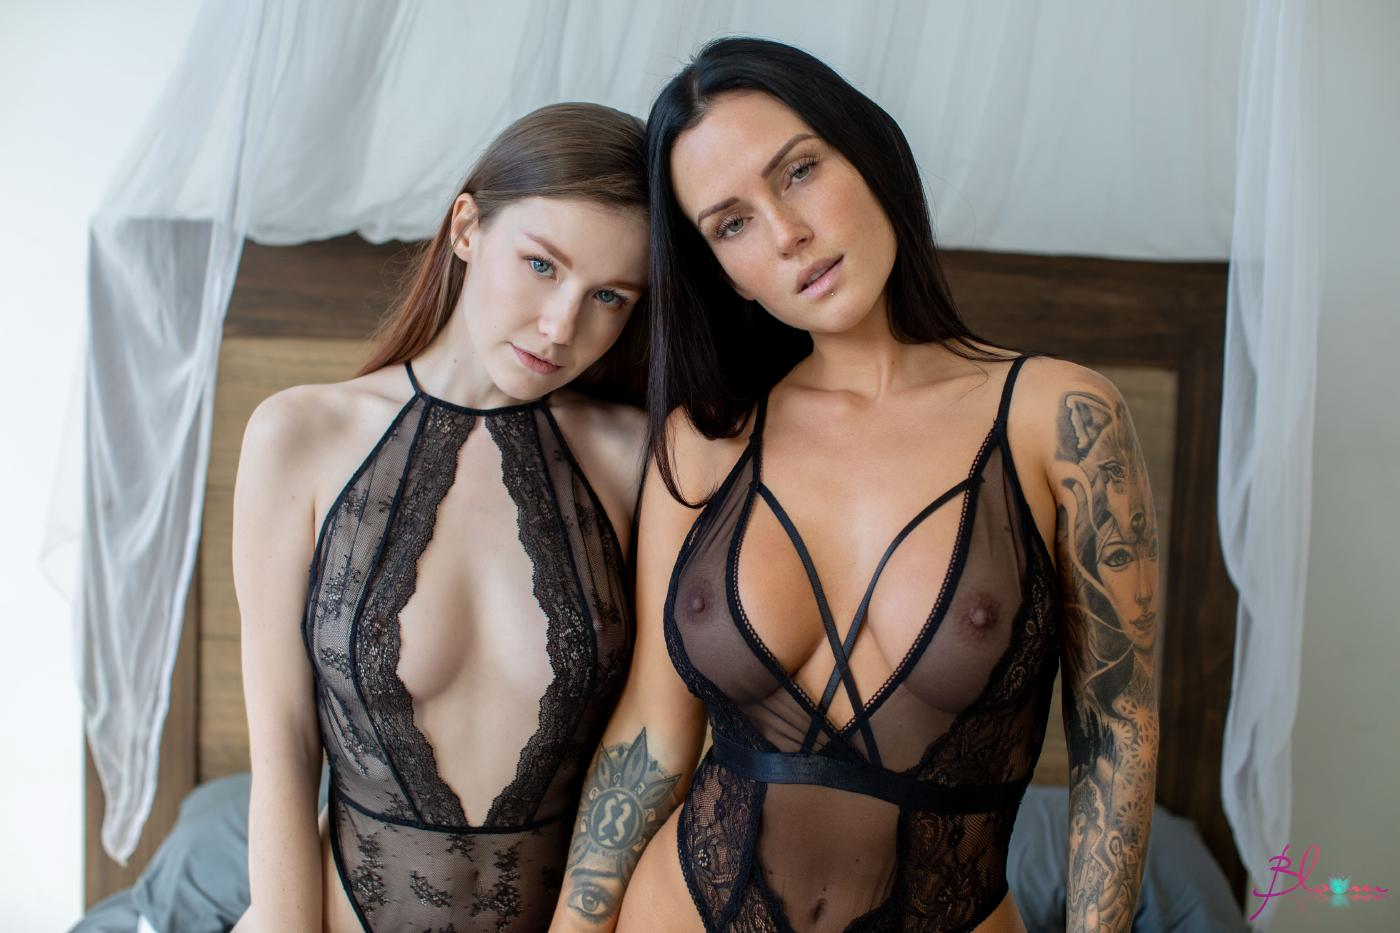 Emily Bloom Kayla Lauren Lesbian Set Leaked 0019